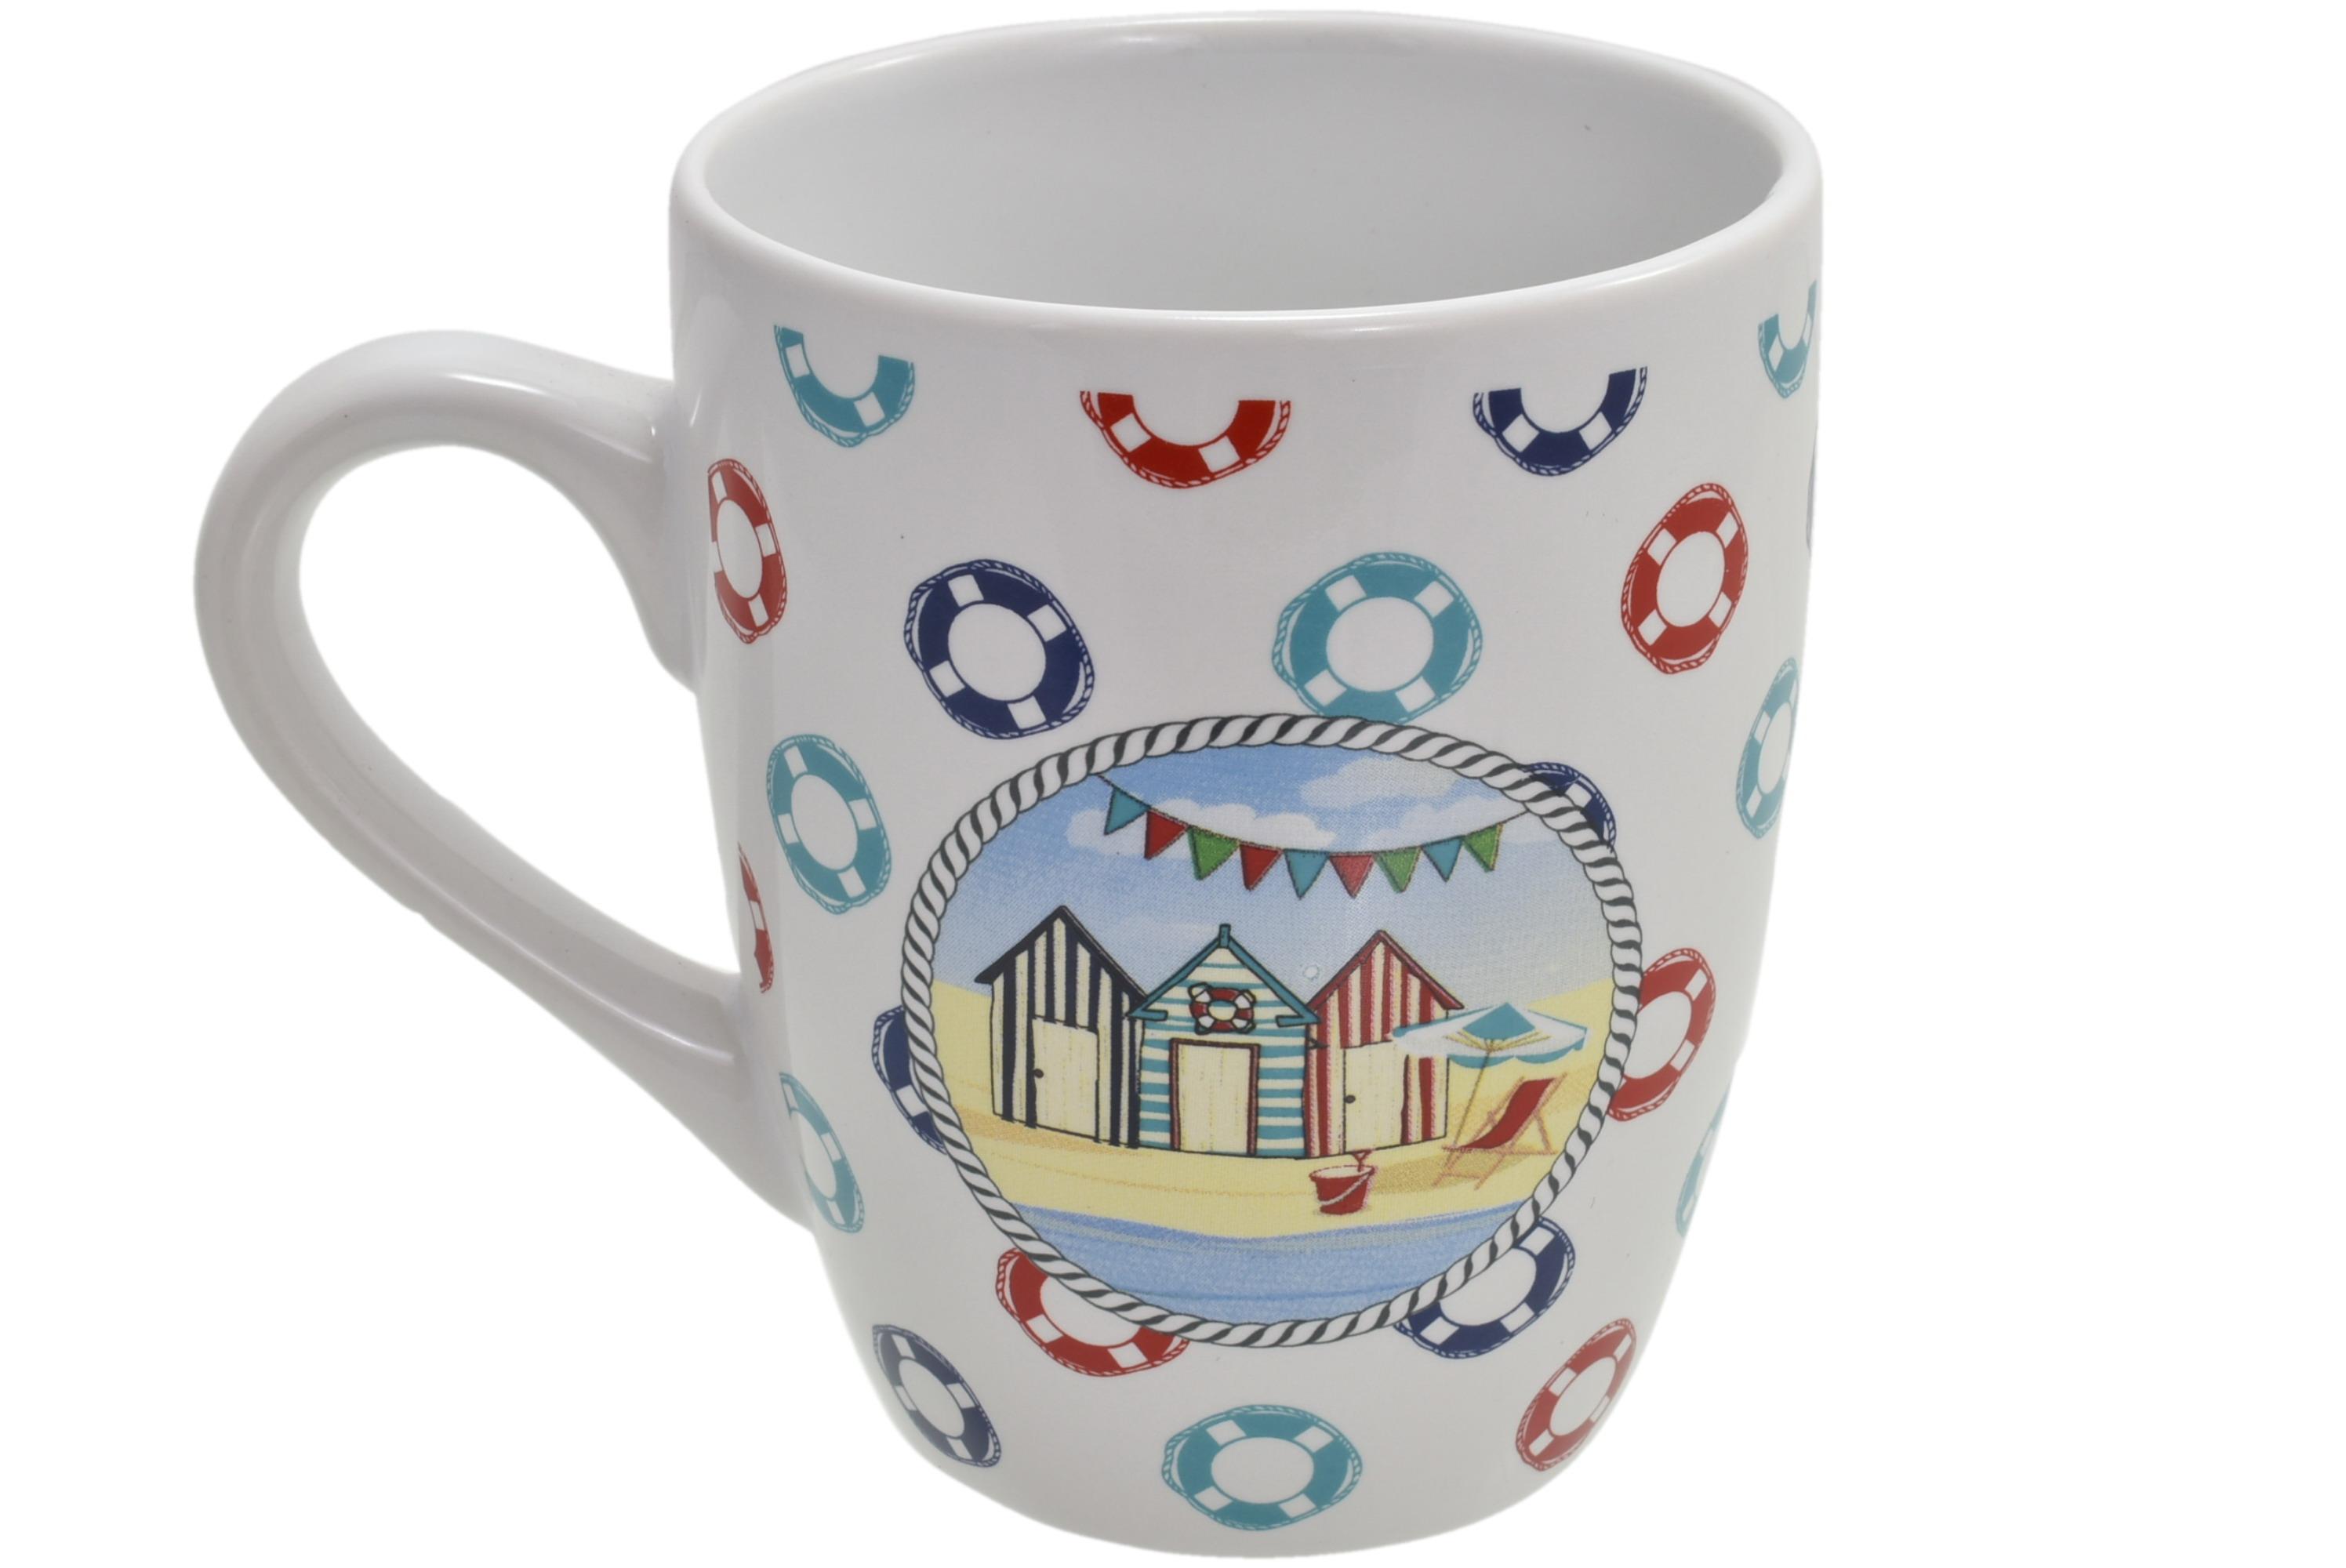 Ceramic Beach Hut Design Mug Lifering Print